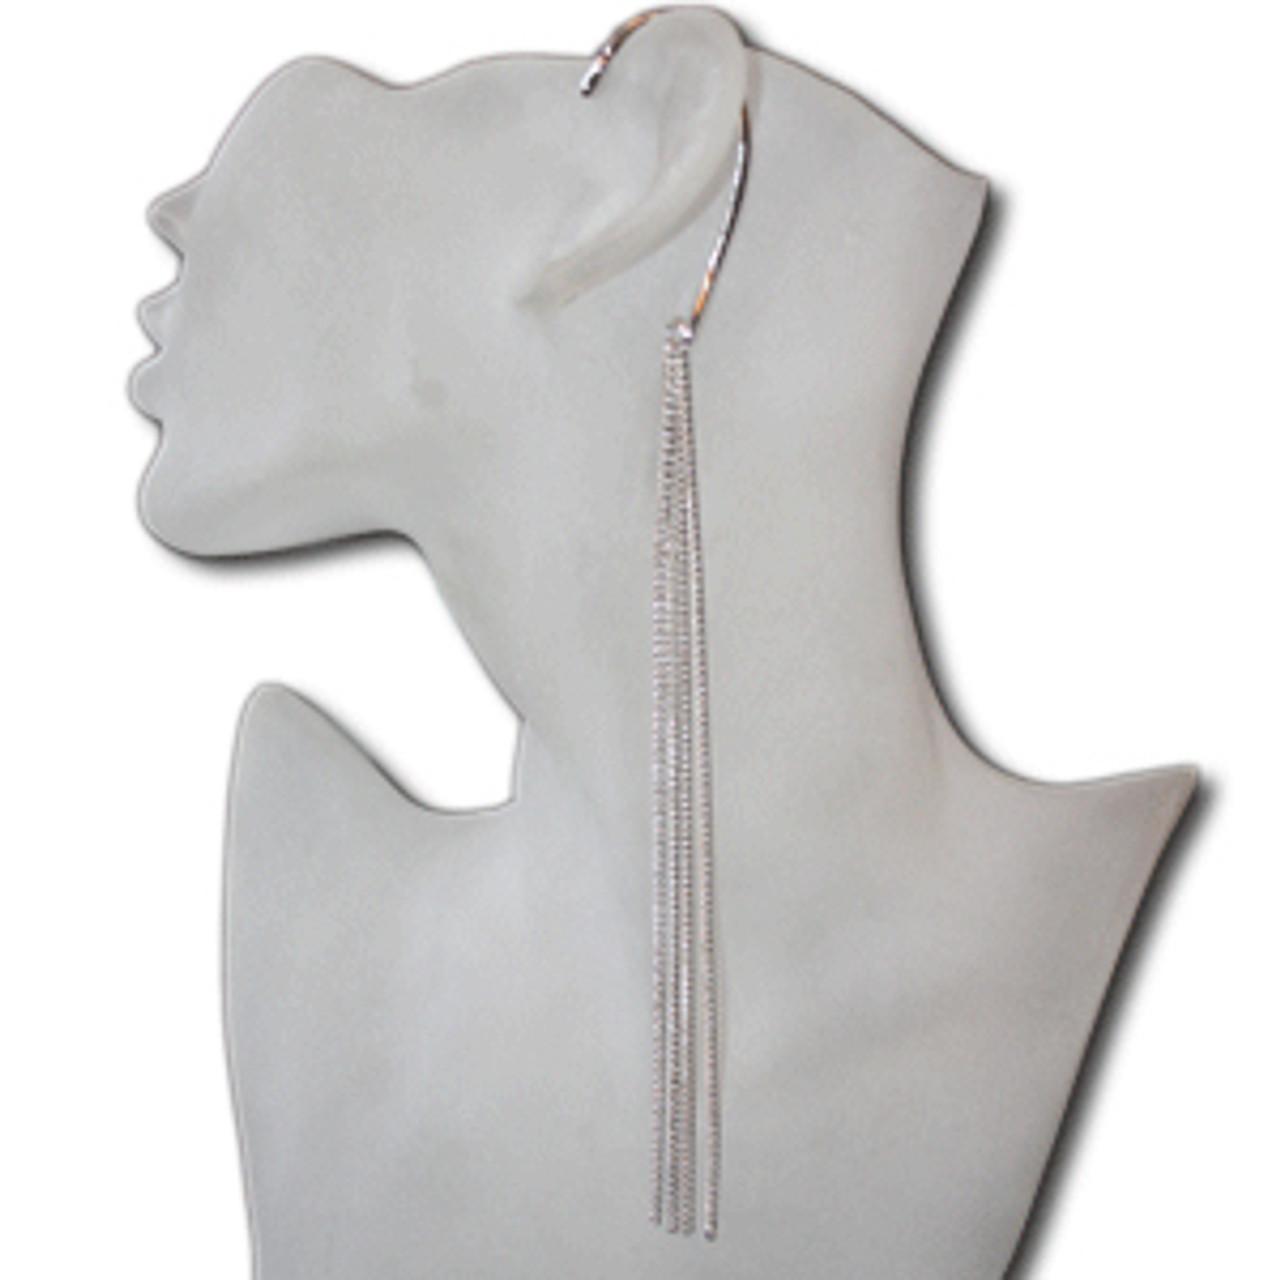 Fashion ear wraps